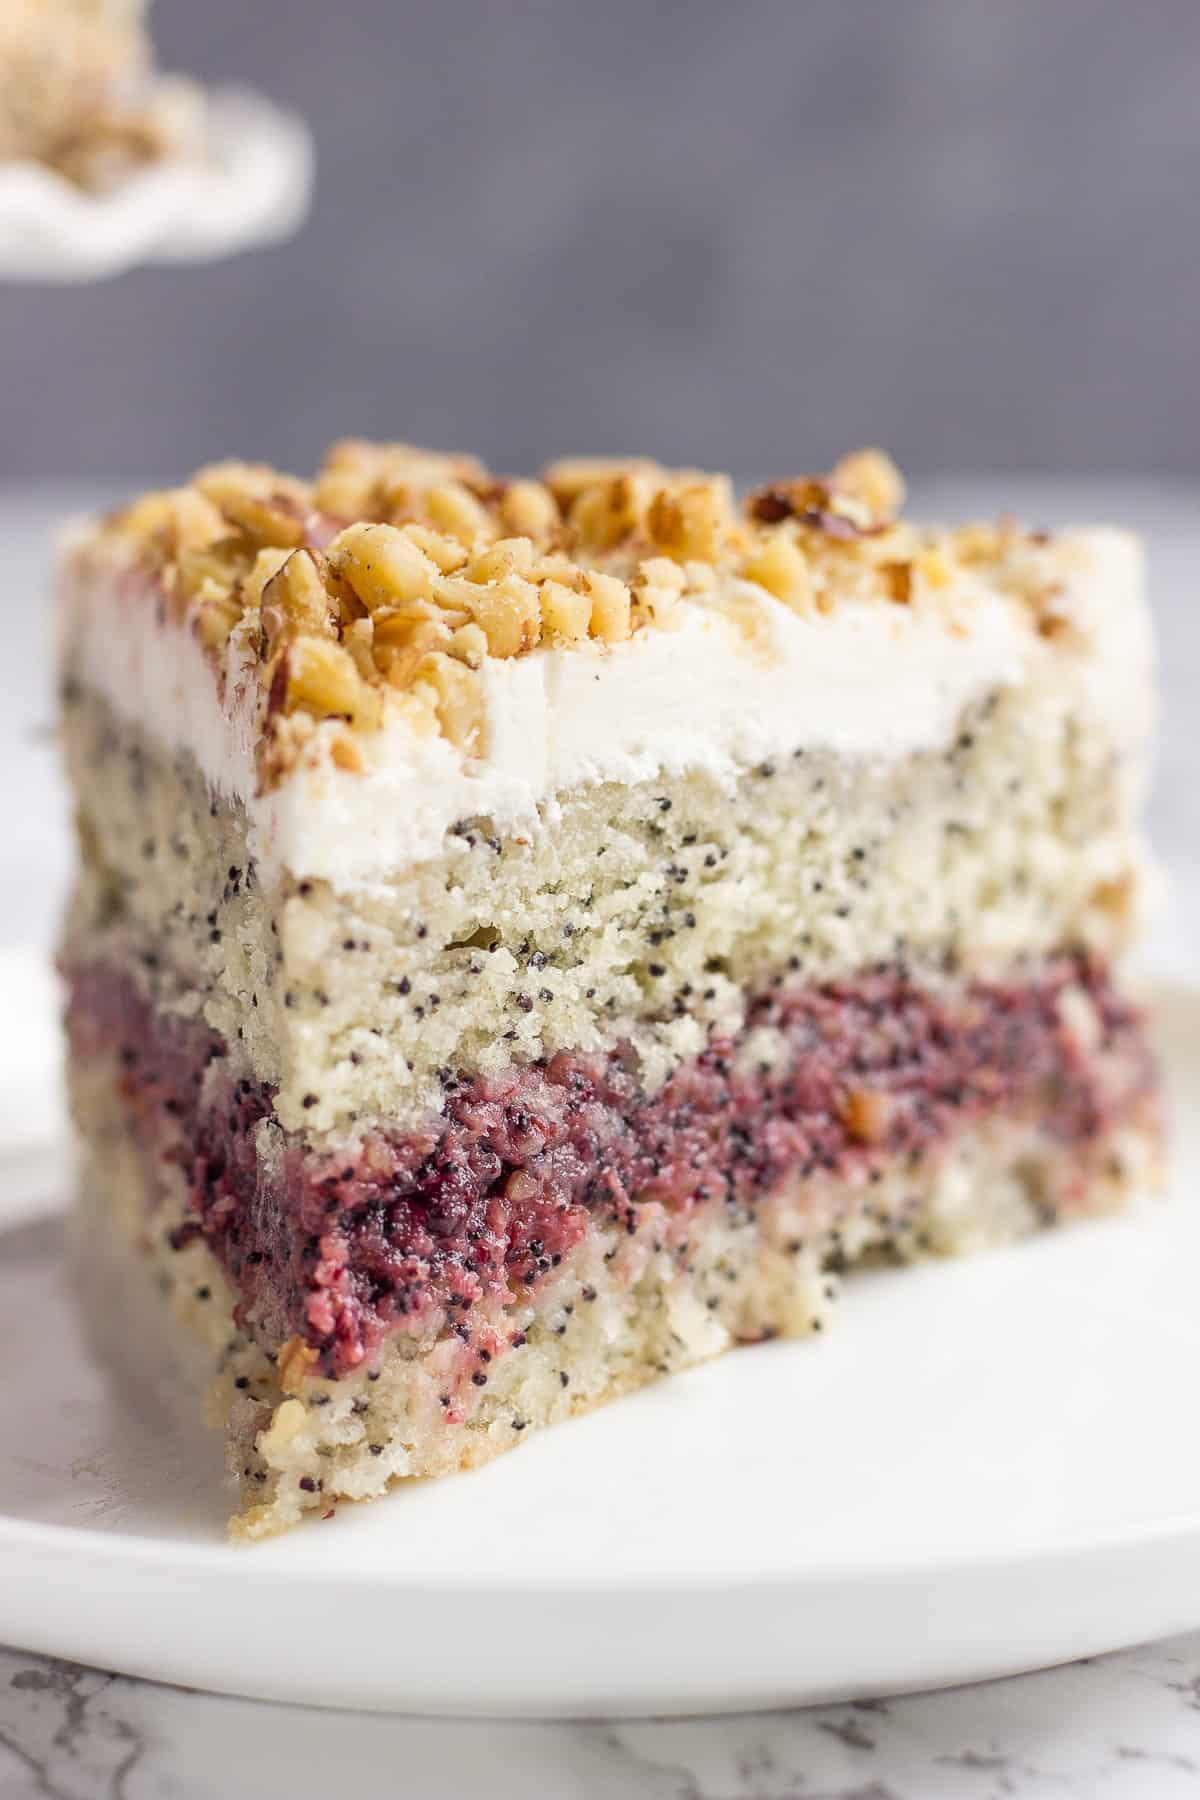 Vegan layer cake with poppy seeds